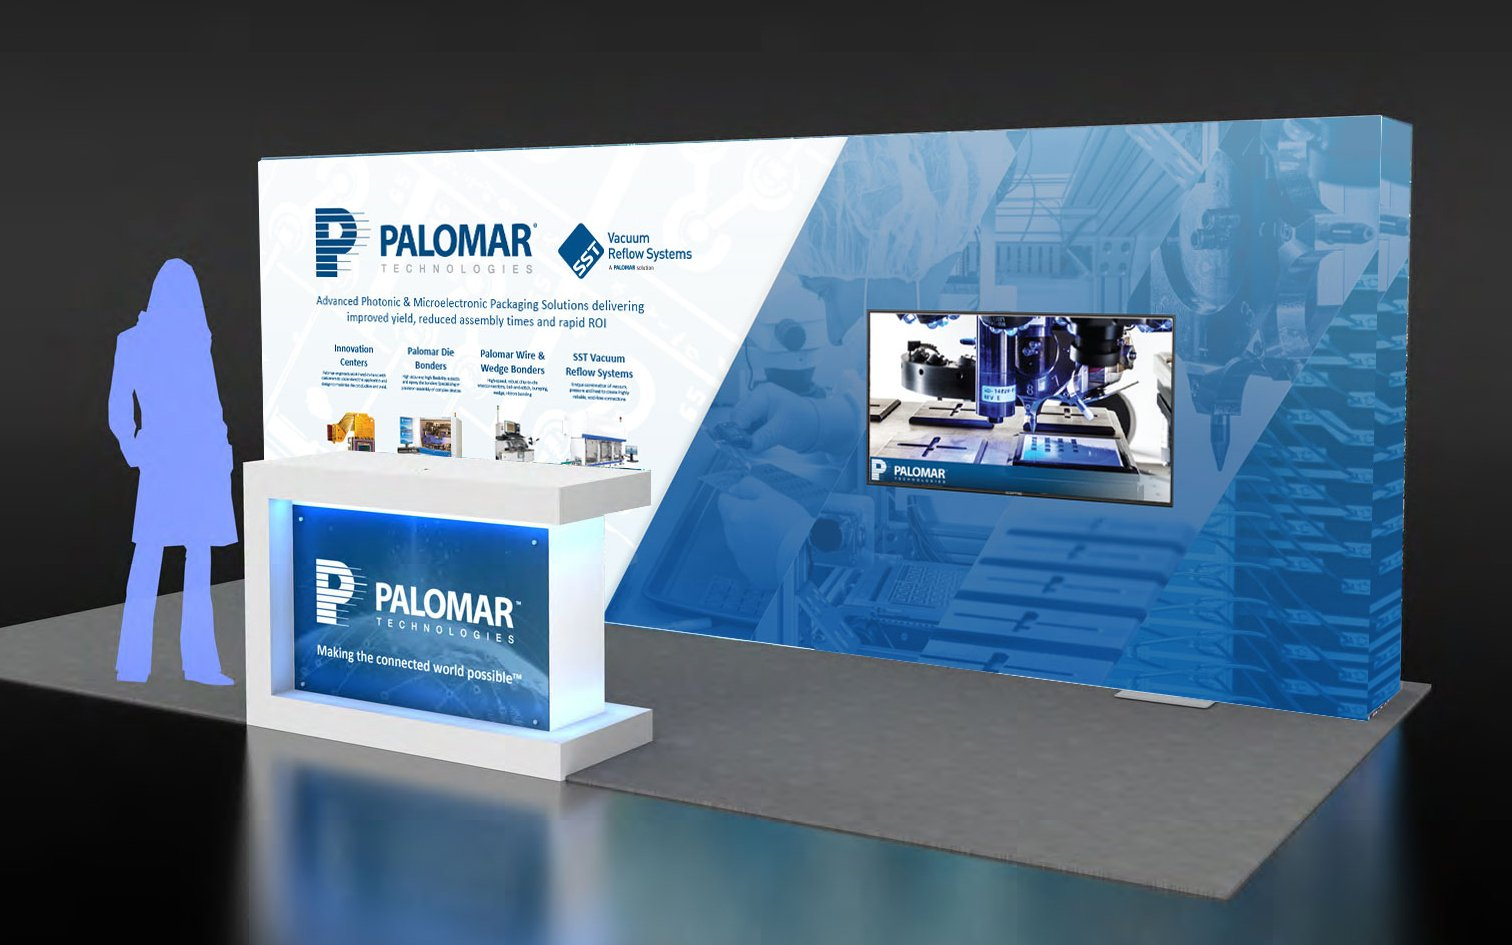 Palomar-Booth